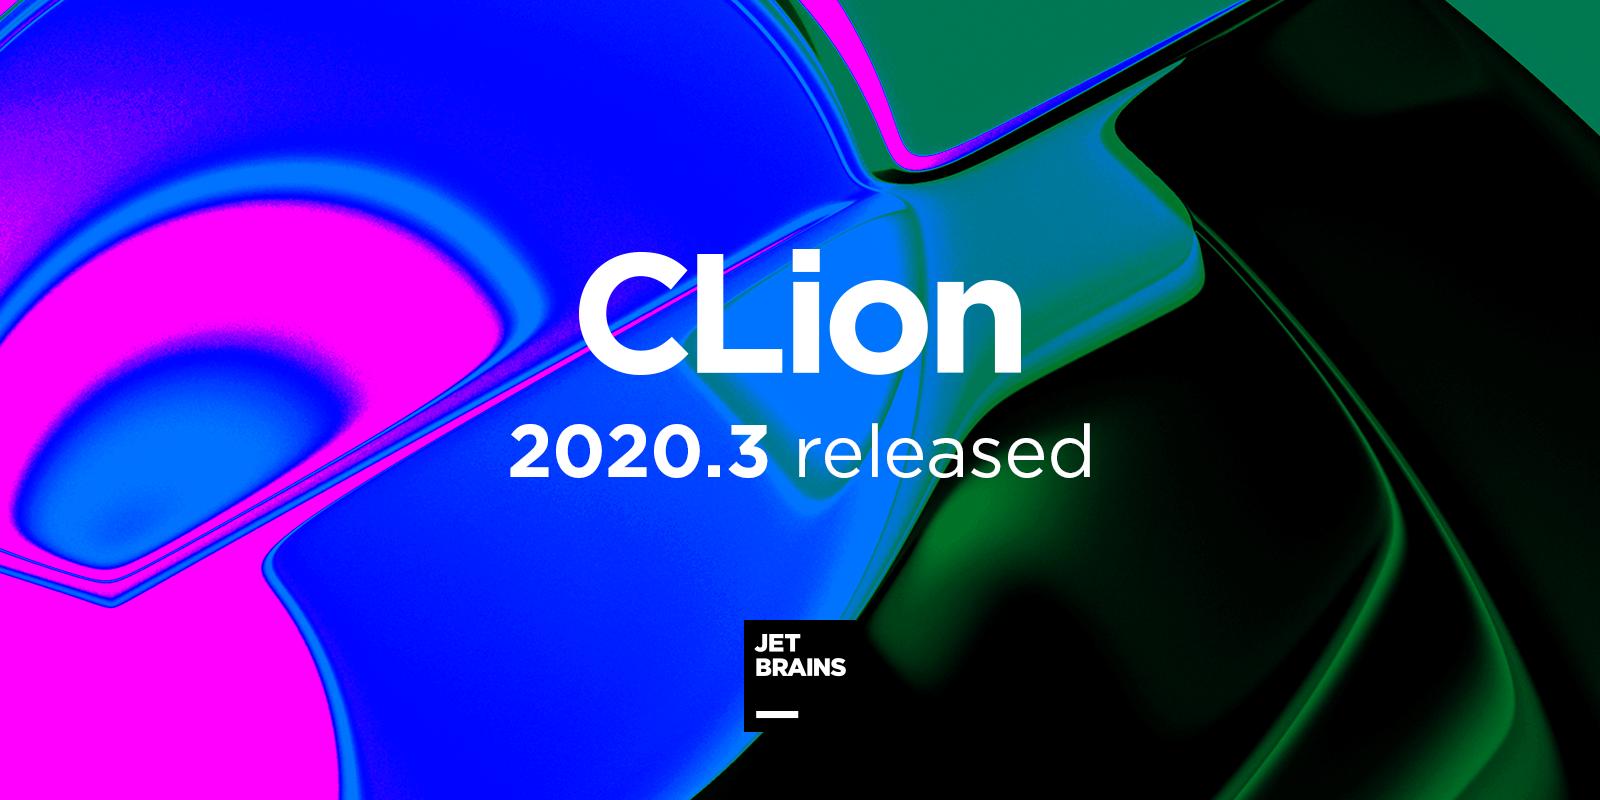 CLion 2020.3 release